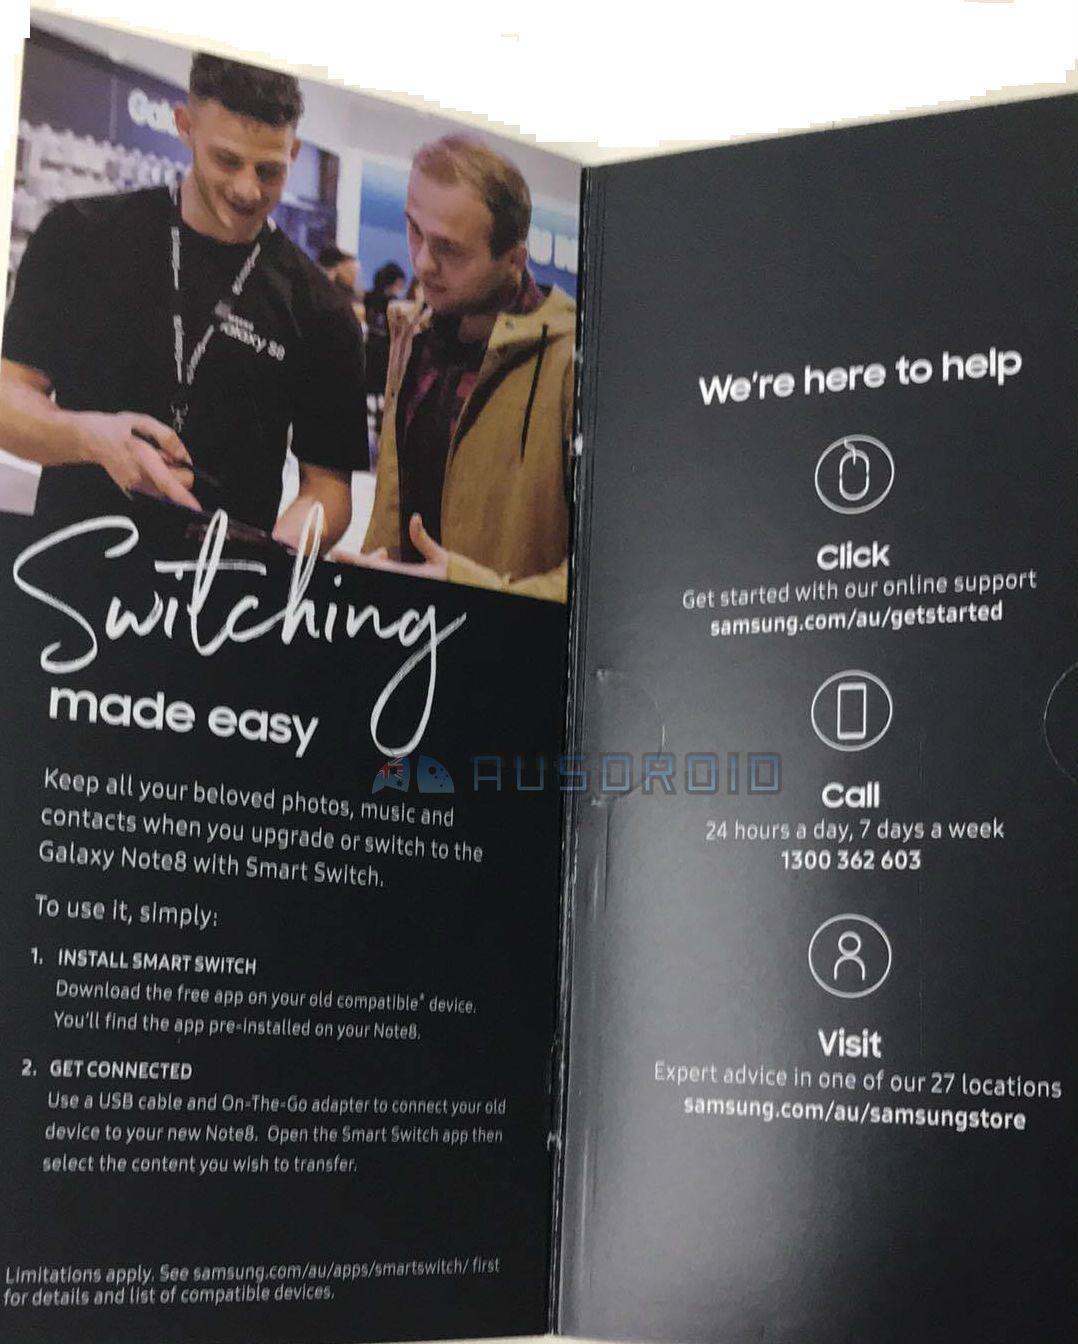 Samsung Galaxy Note 8 Functii Dezvaluite Material Promotional 1